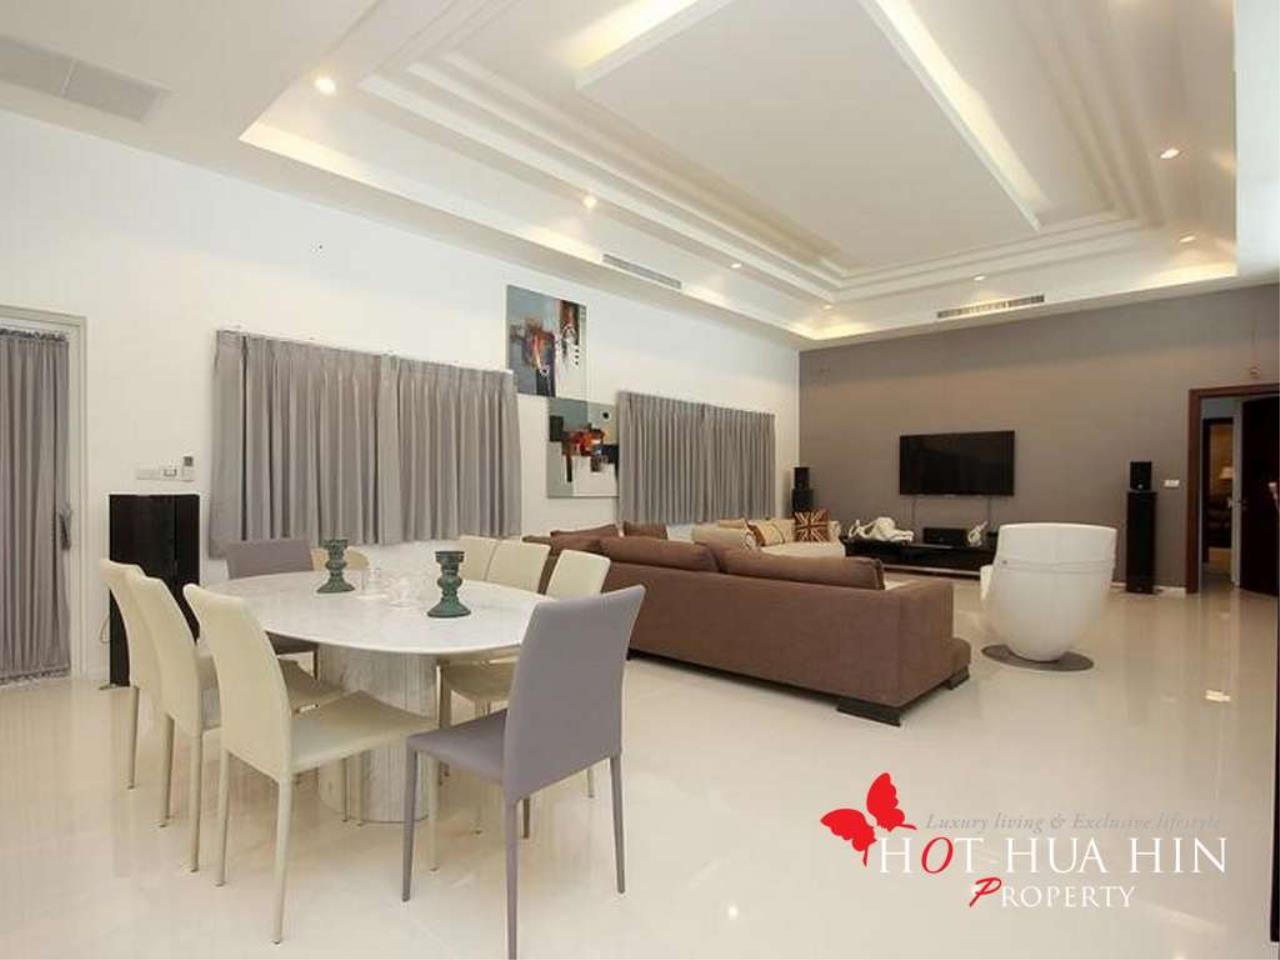 Hot Hua Hin Co. Ltd. Agency's New Luxury Smart Home In Popular Area 7